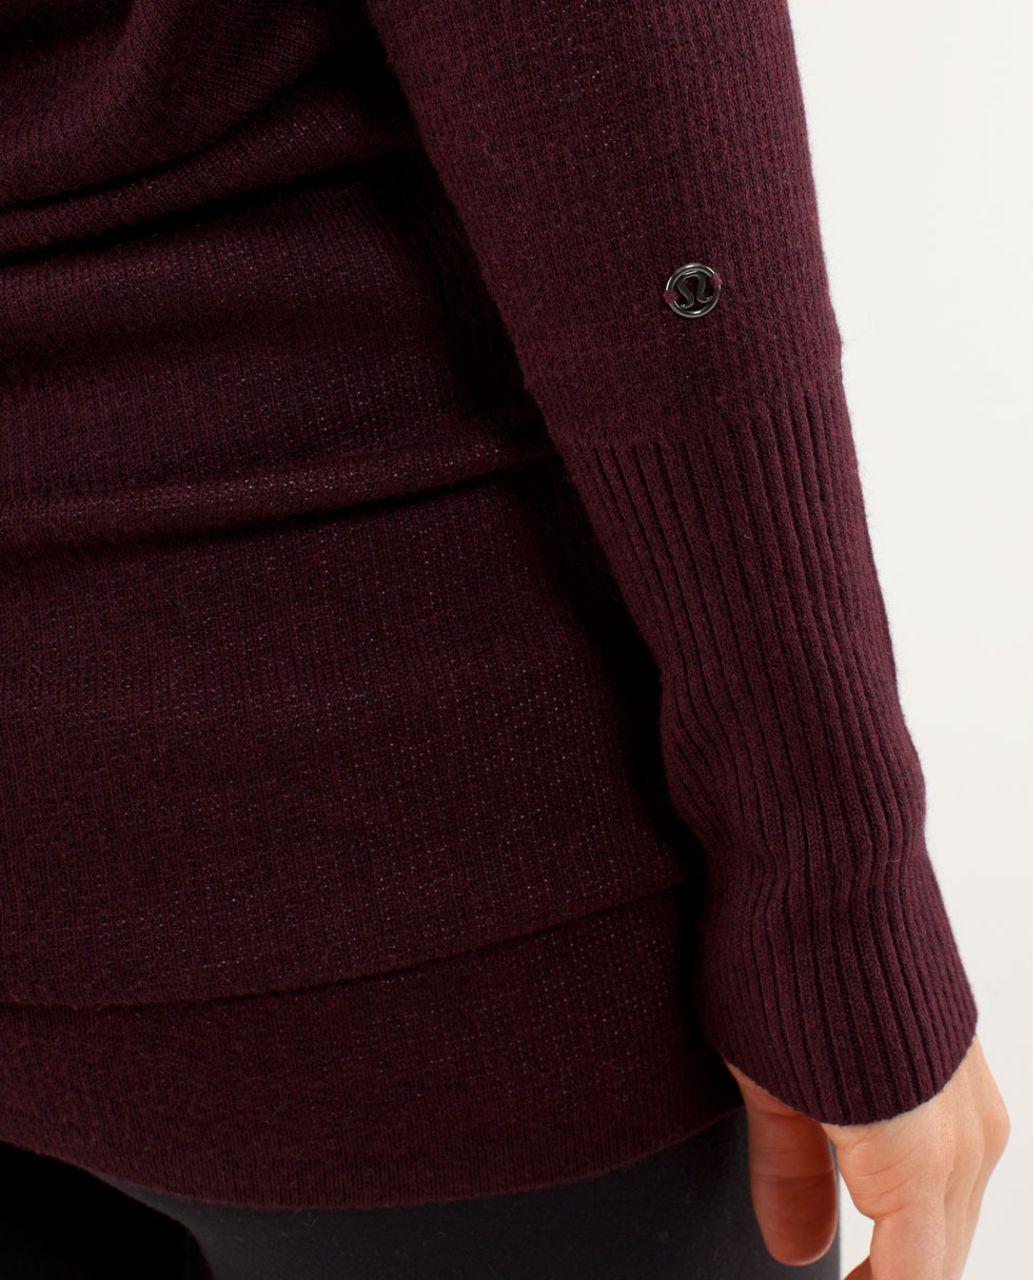 7471e97545b Lululemon Serenity Sweater Wrap - Heathered Bordeaux Drama   Heathered  Pretty Pink